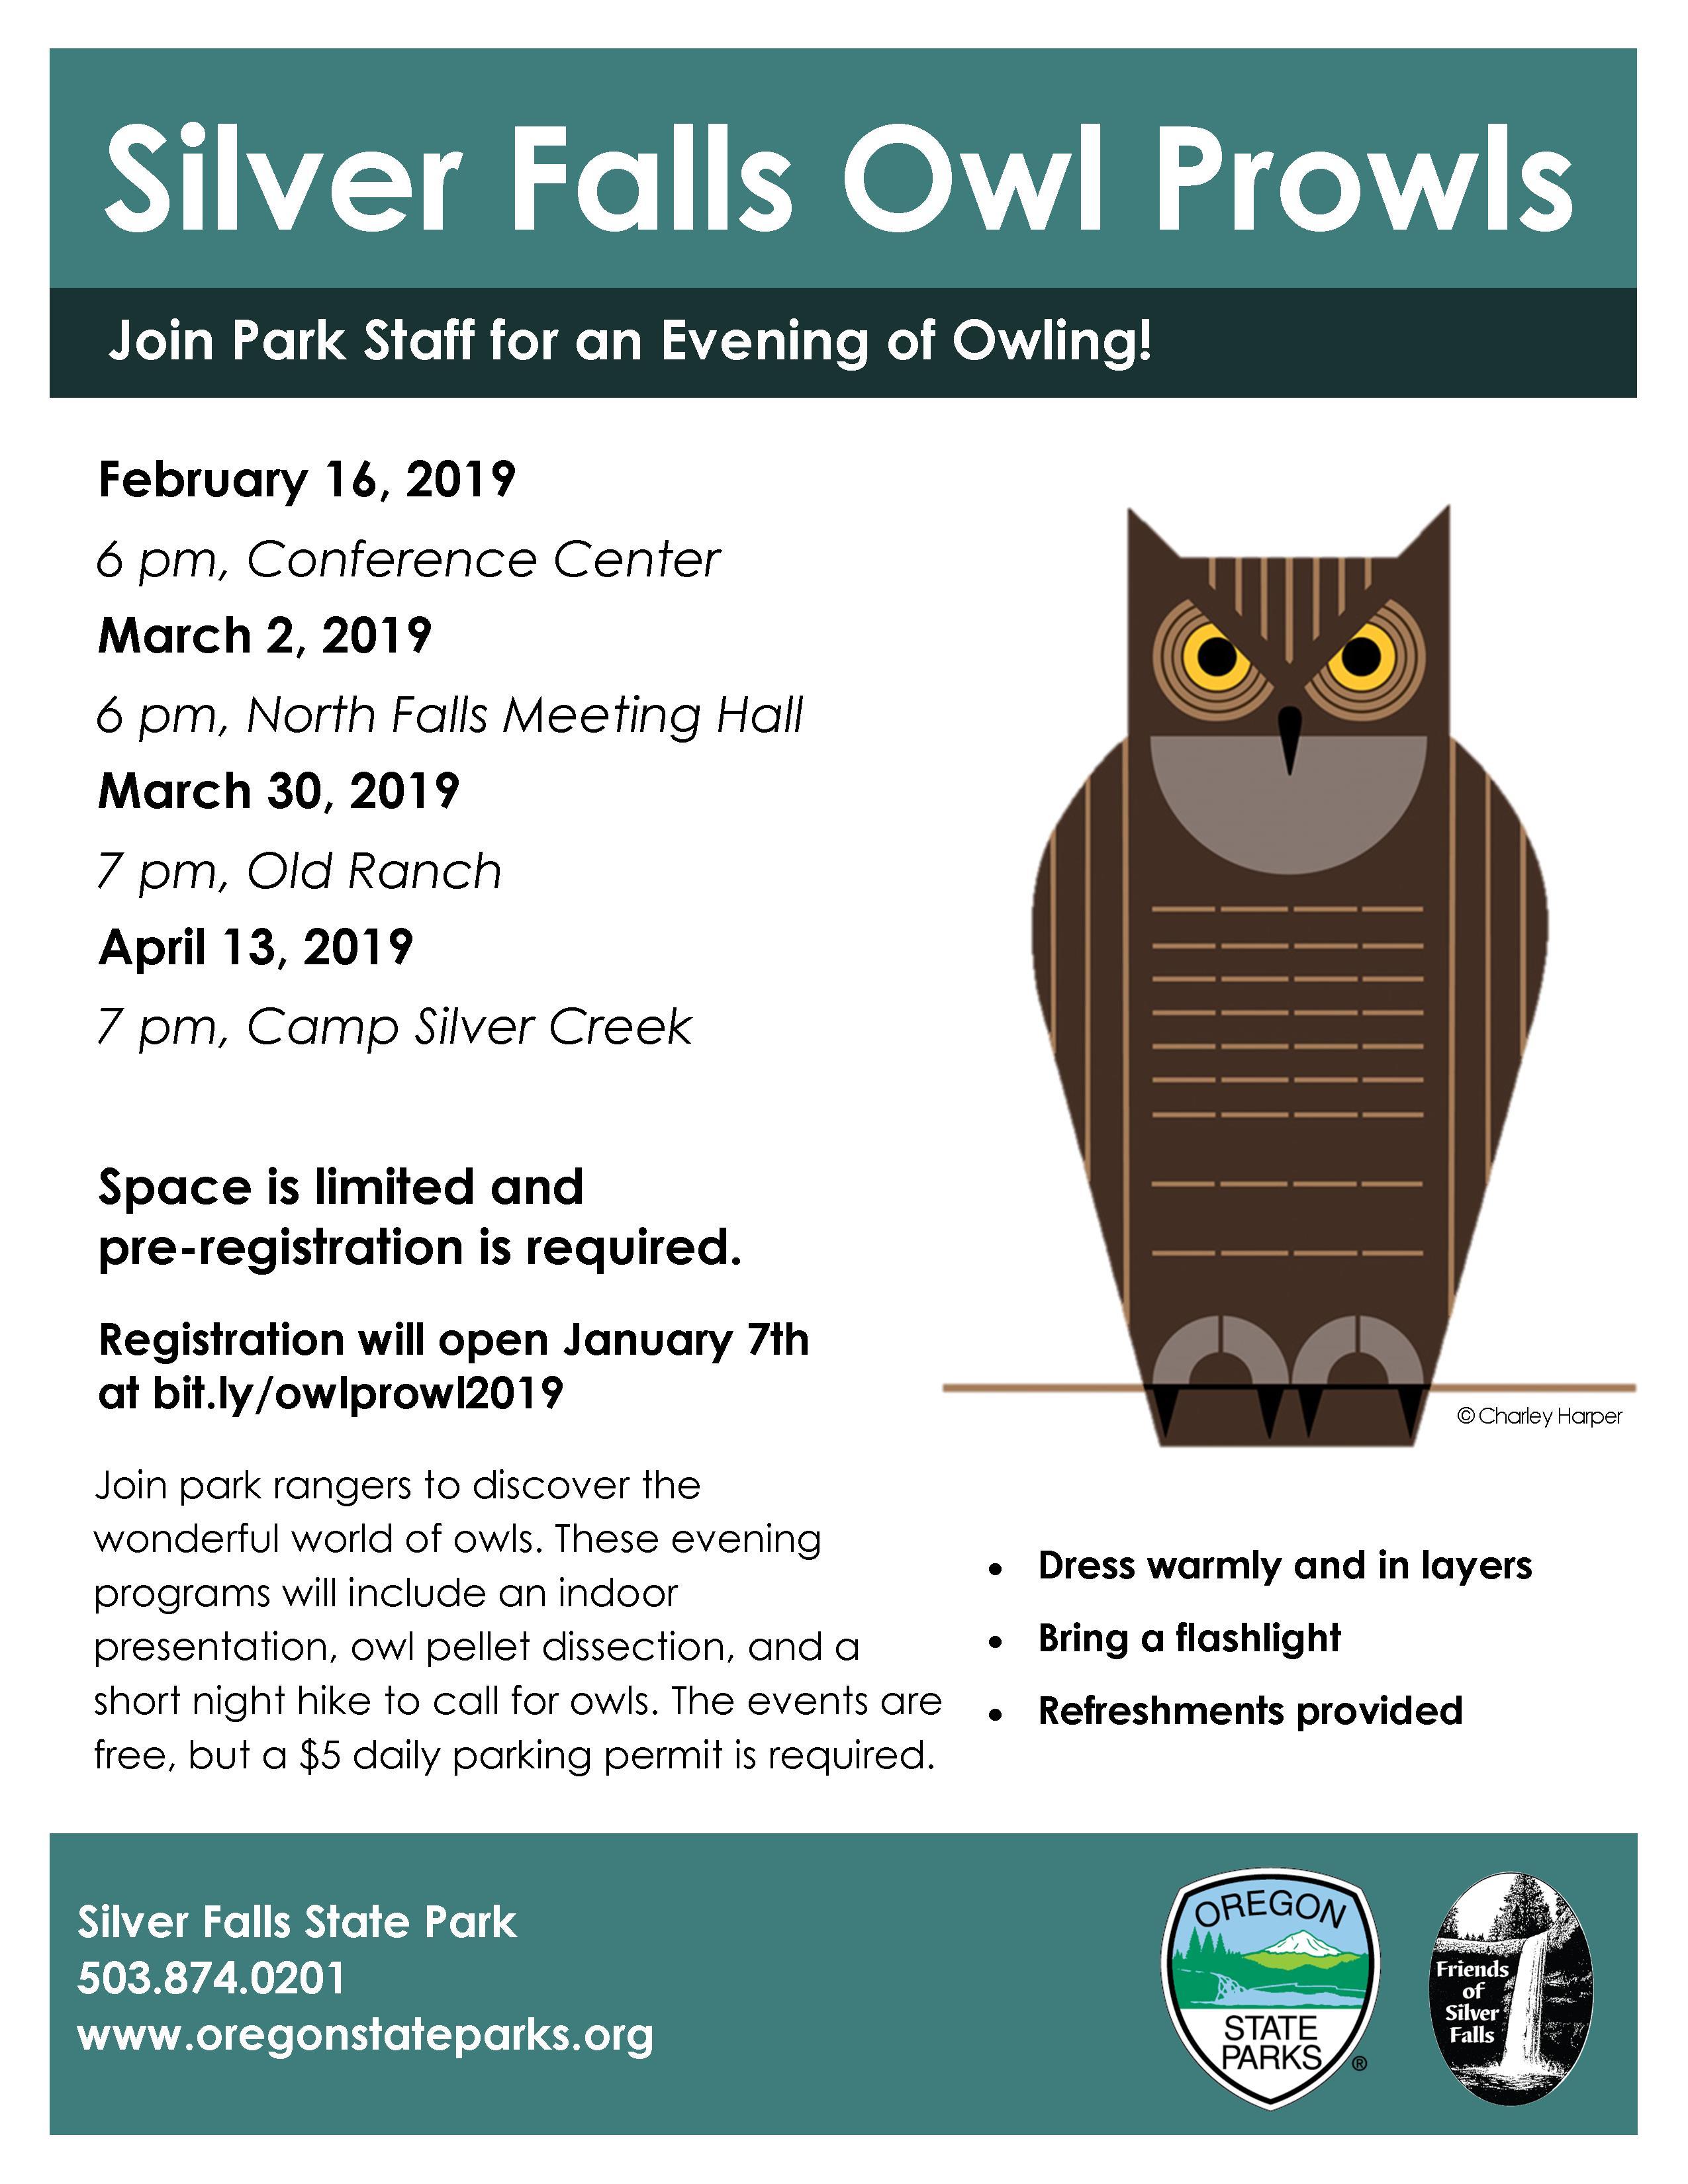 2019 Silver Falls Owl Prowls | Discover Silver Falls